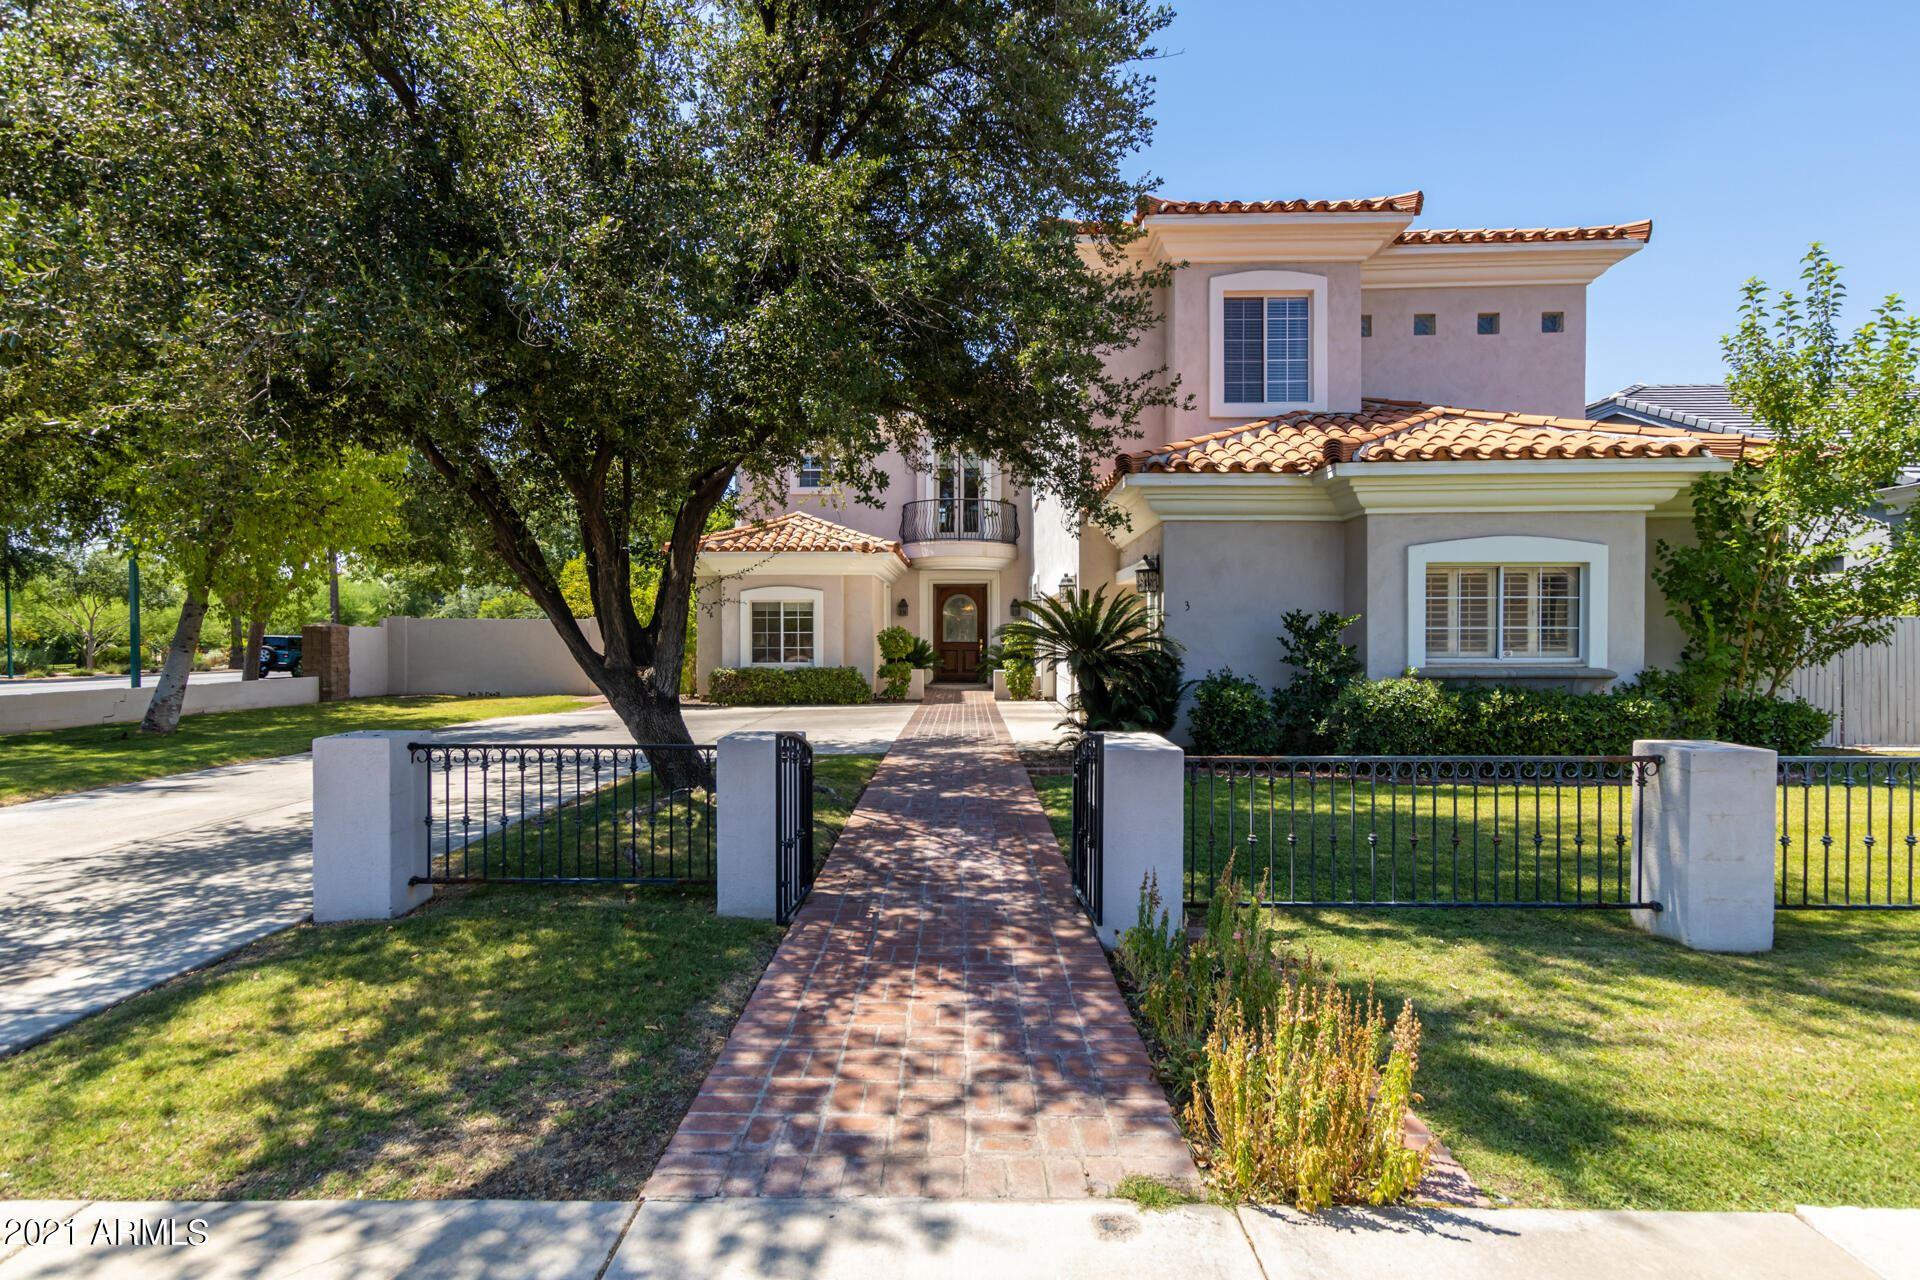 3 W SAN JUAN Avenue, Phoenix, AZ 85013 - MLS#: 6233741